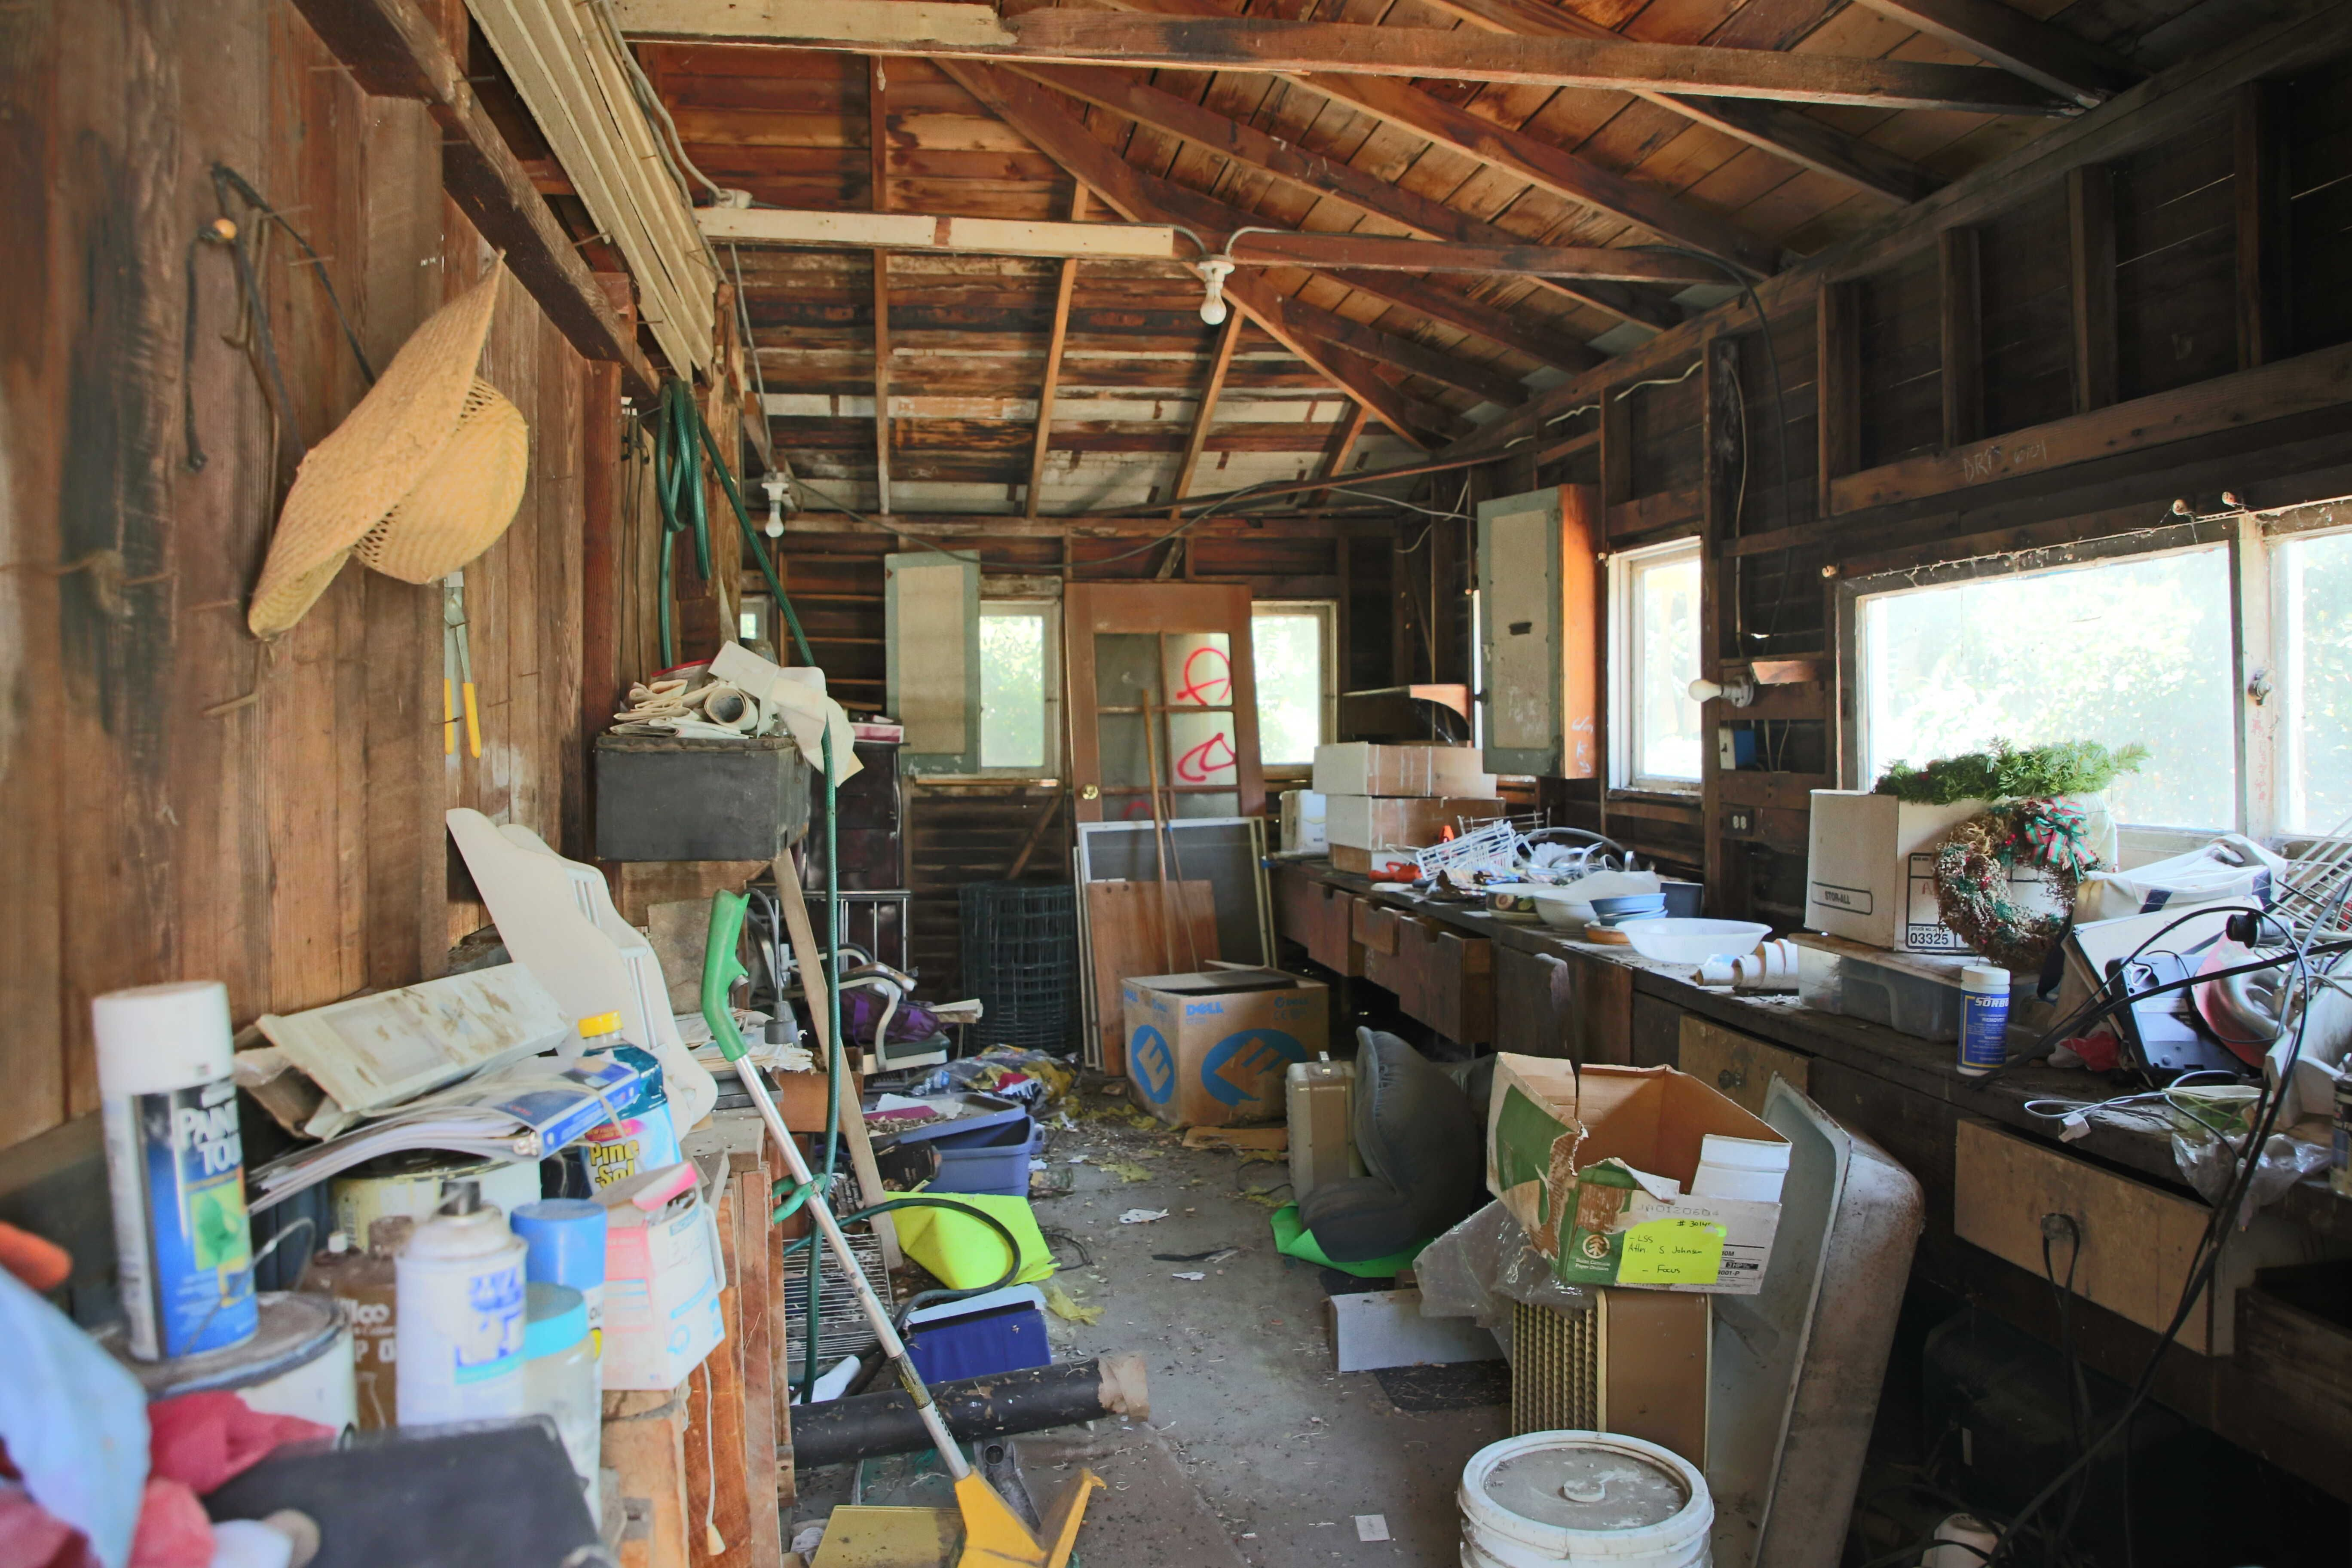 Huge additional storage area in garage.